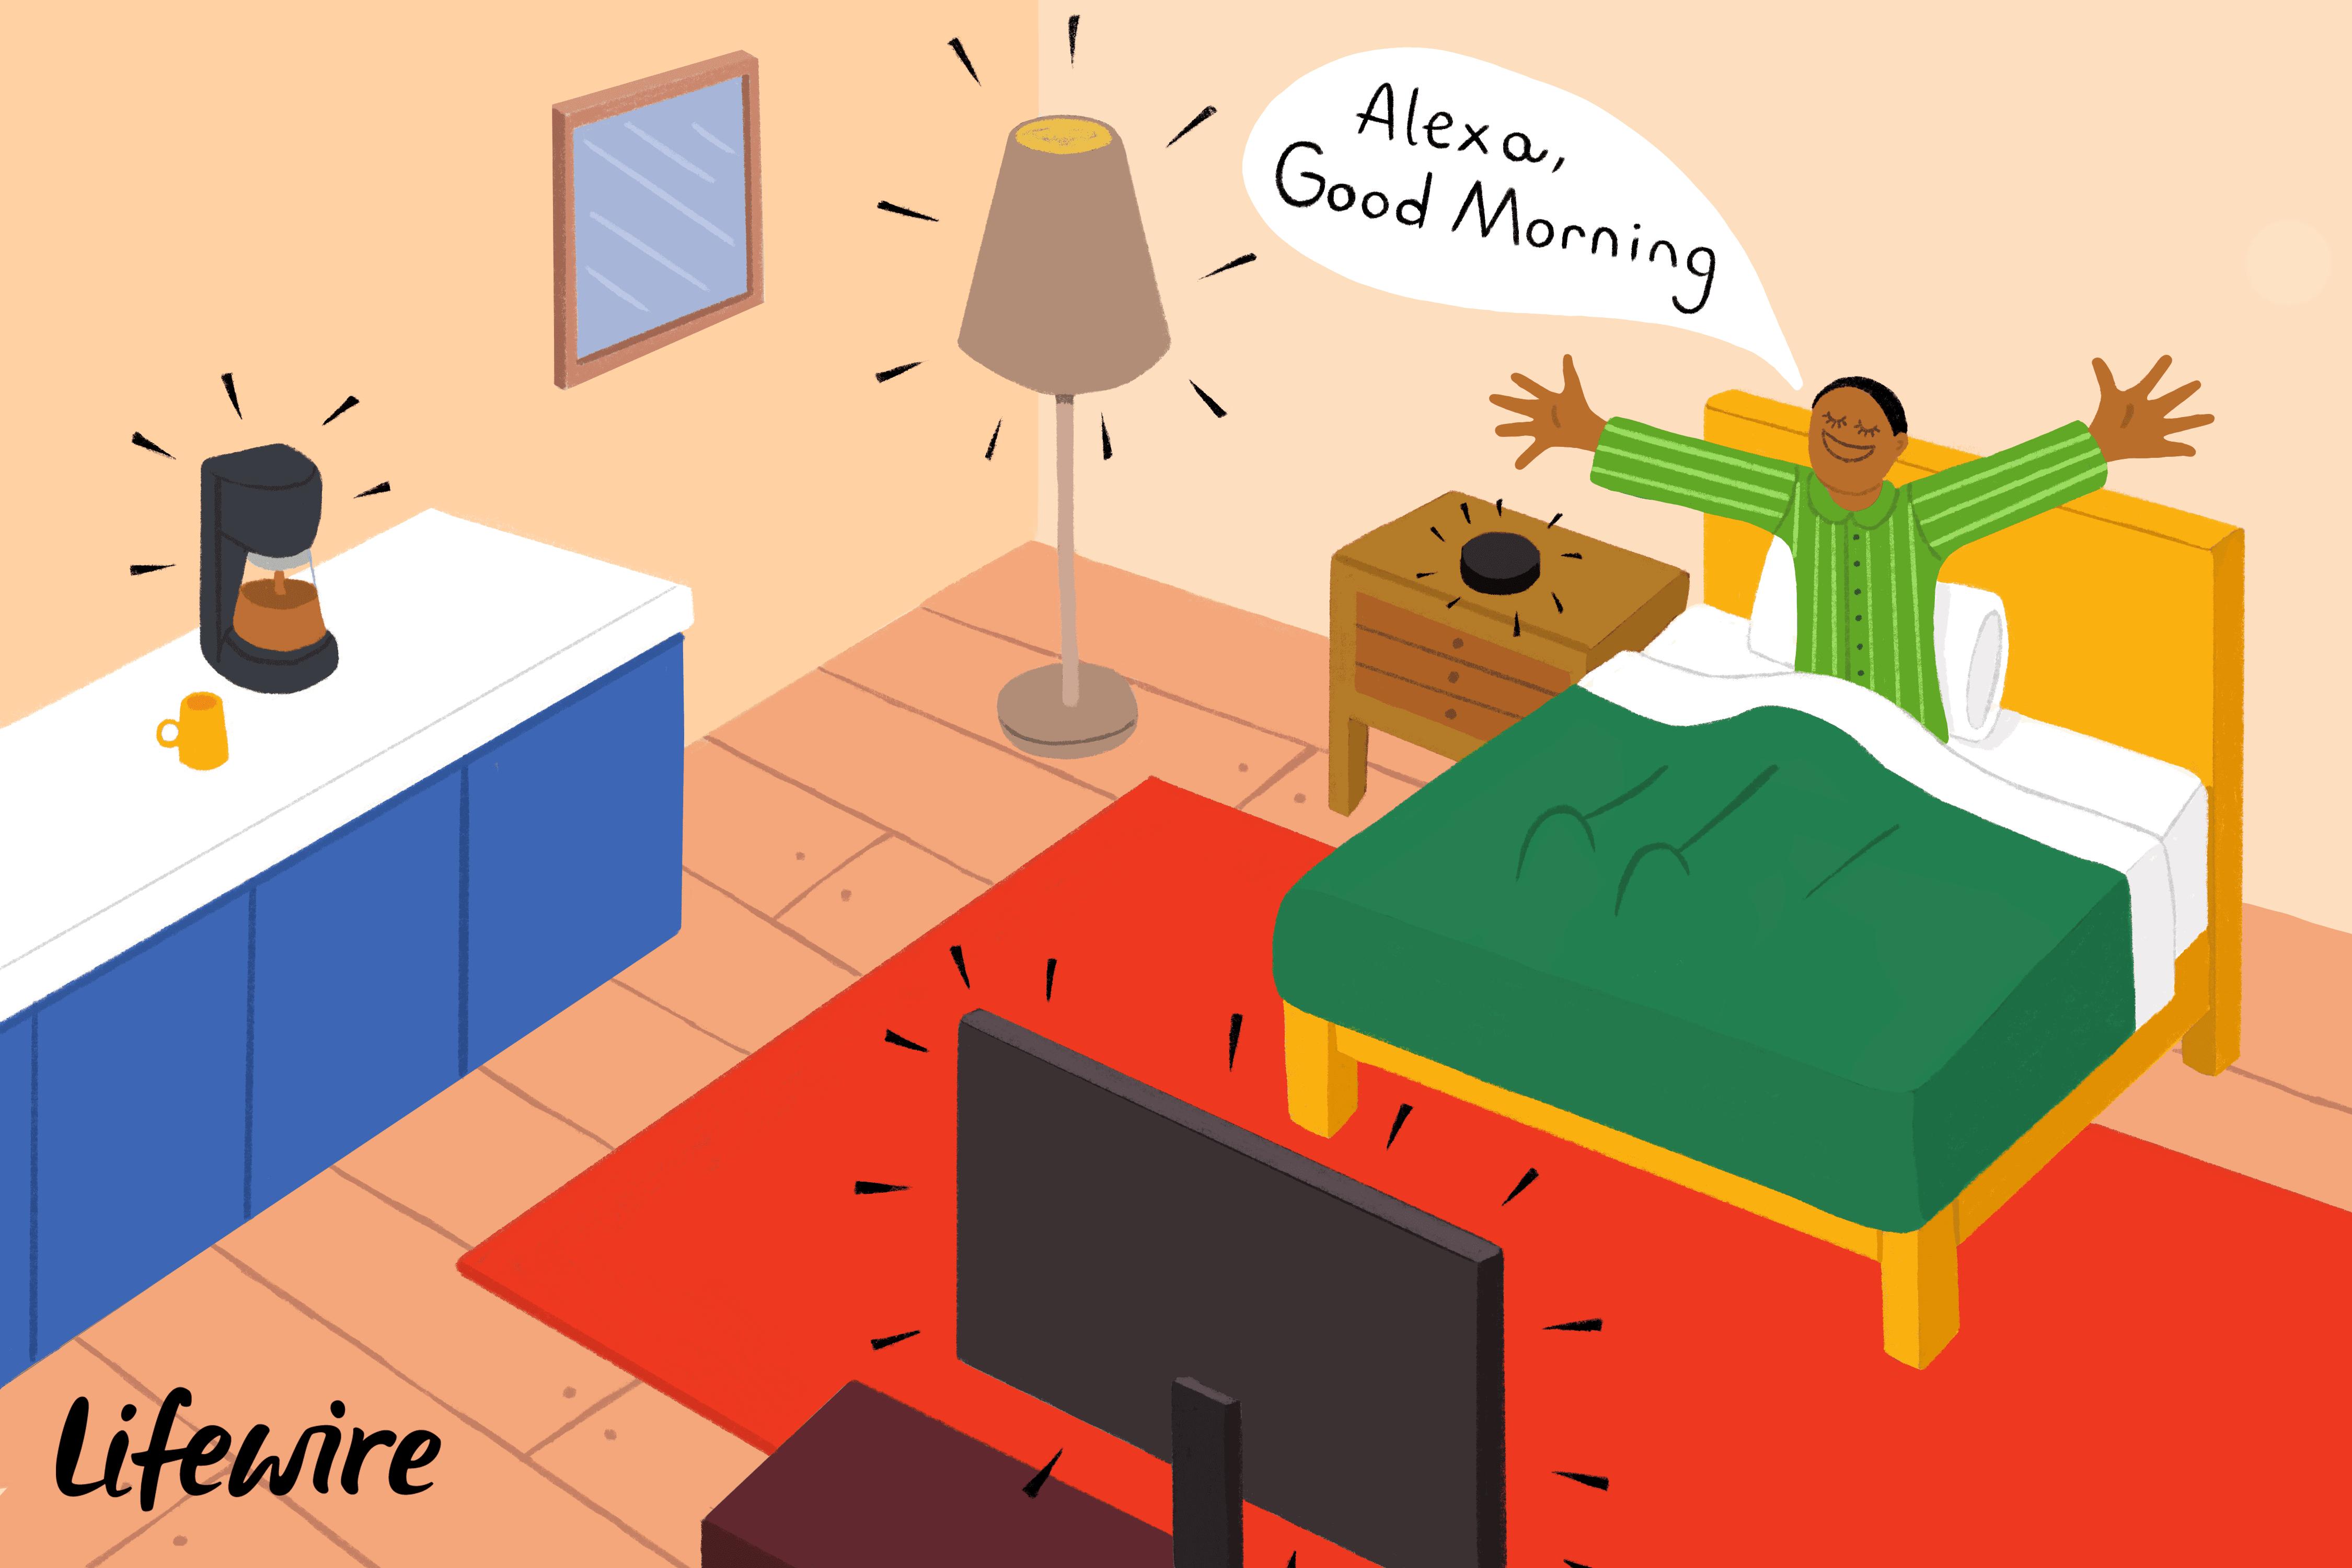 Person wishing Alexa a good morning.